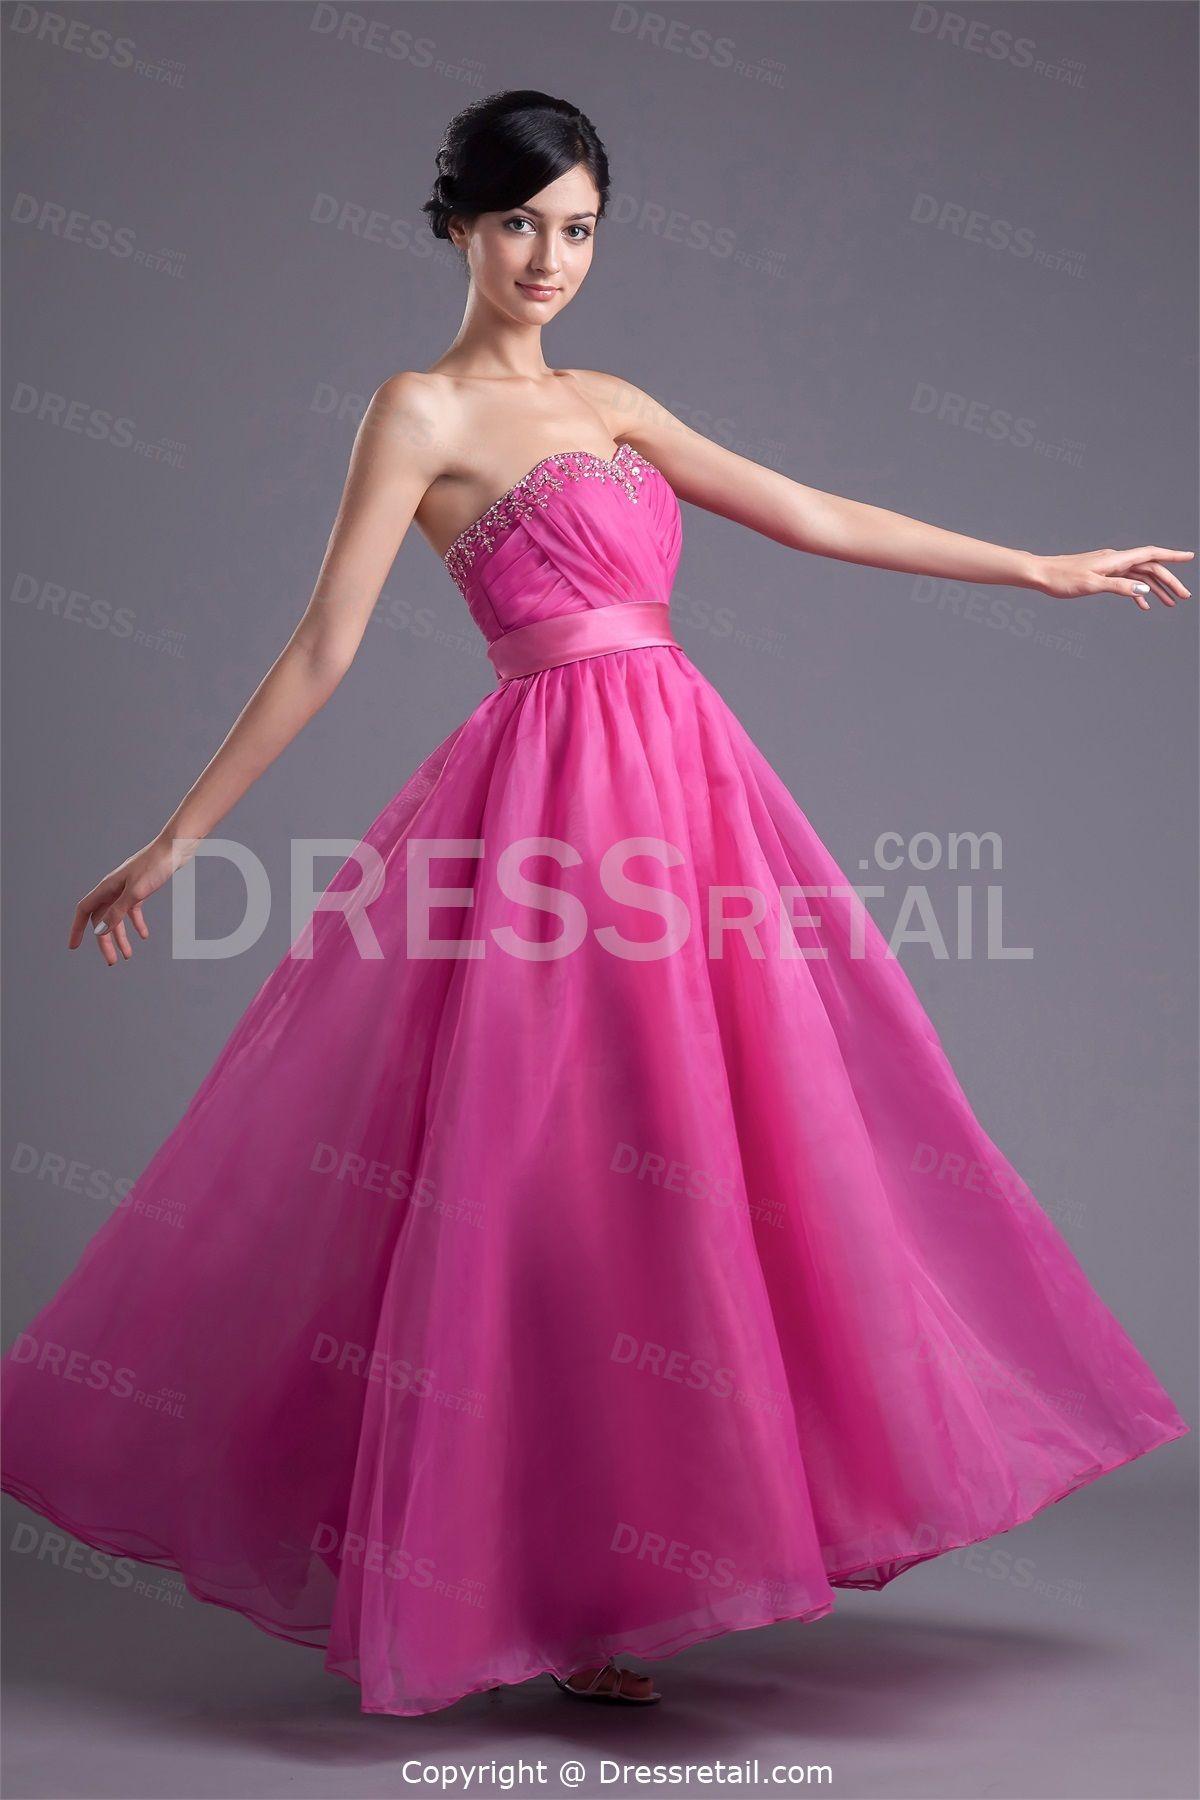 Fantastic Fuchsia Organza A-Line Sleeveless Ankle-Length Prom Dress ...